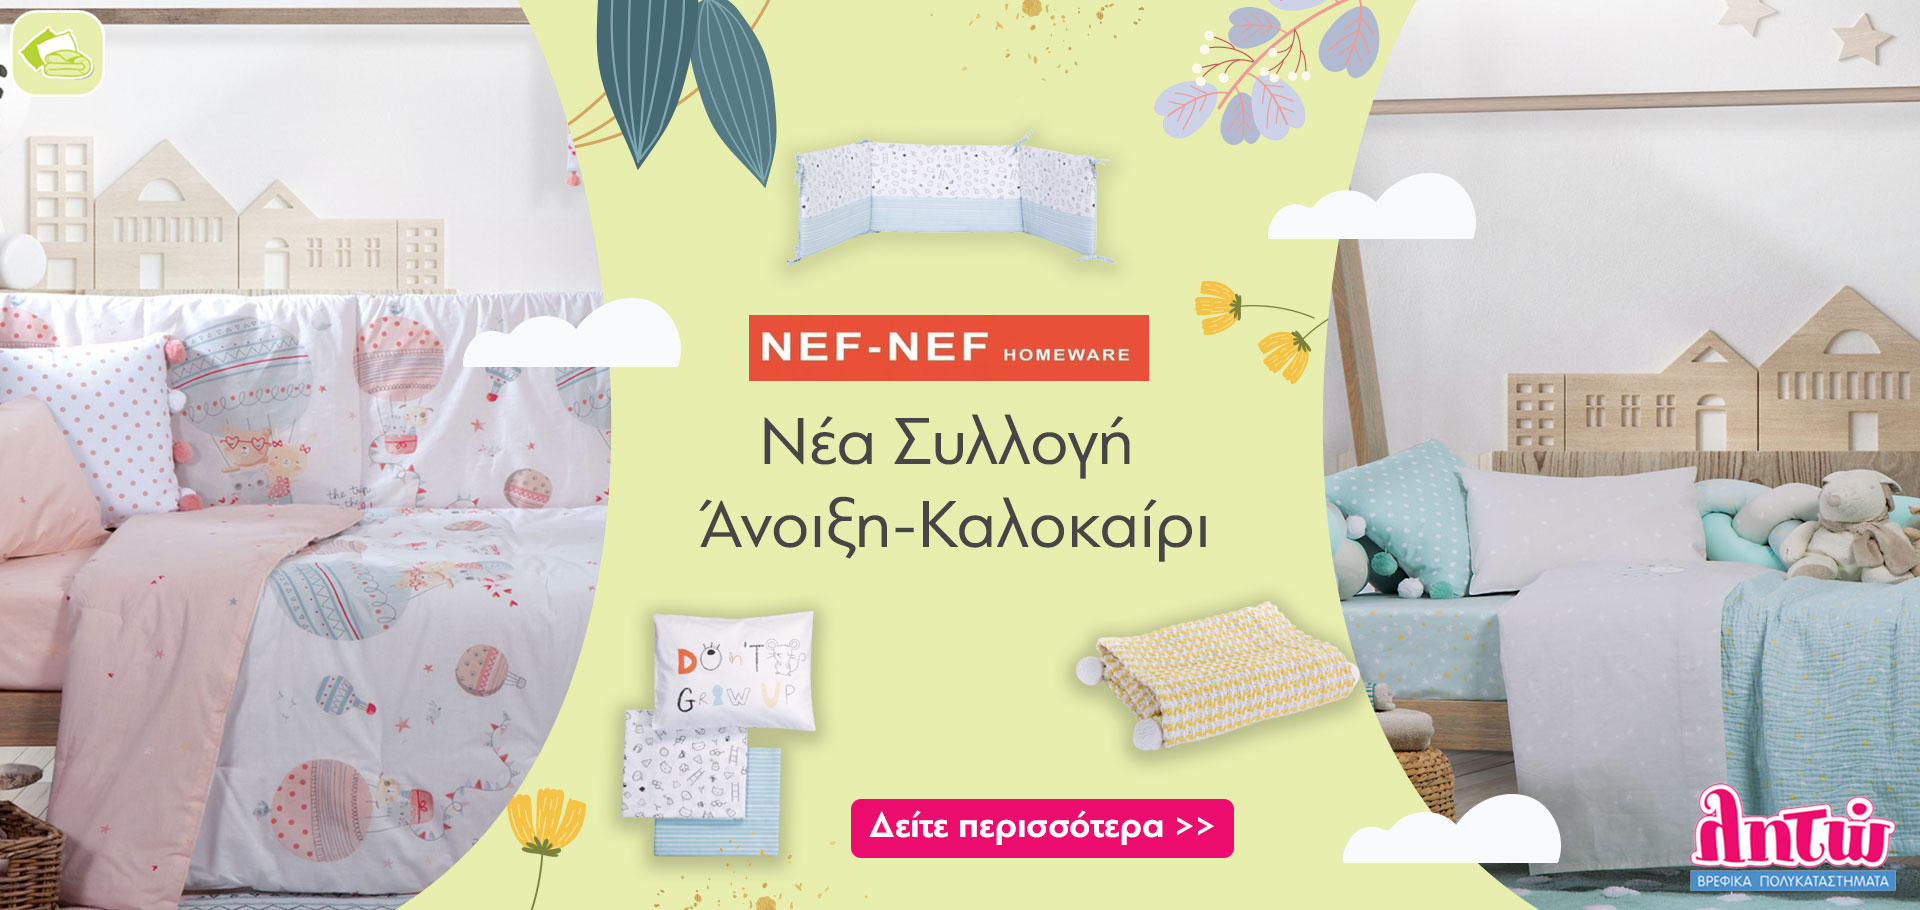 Neff Neff 0421 Νέα συλλογή